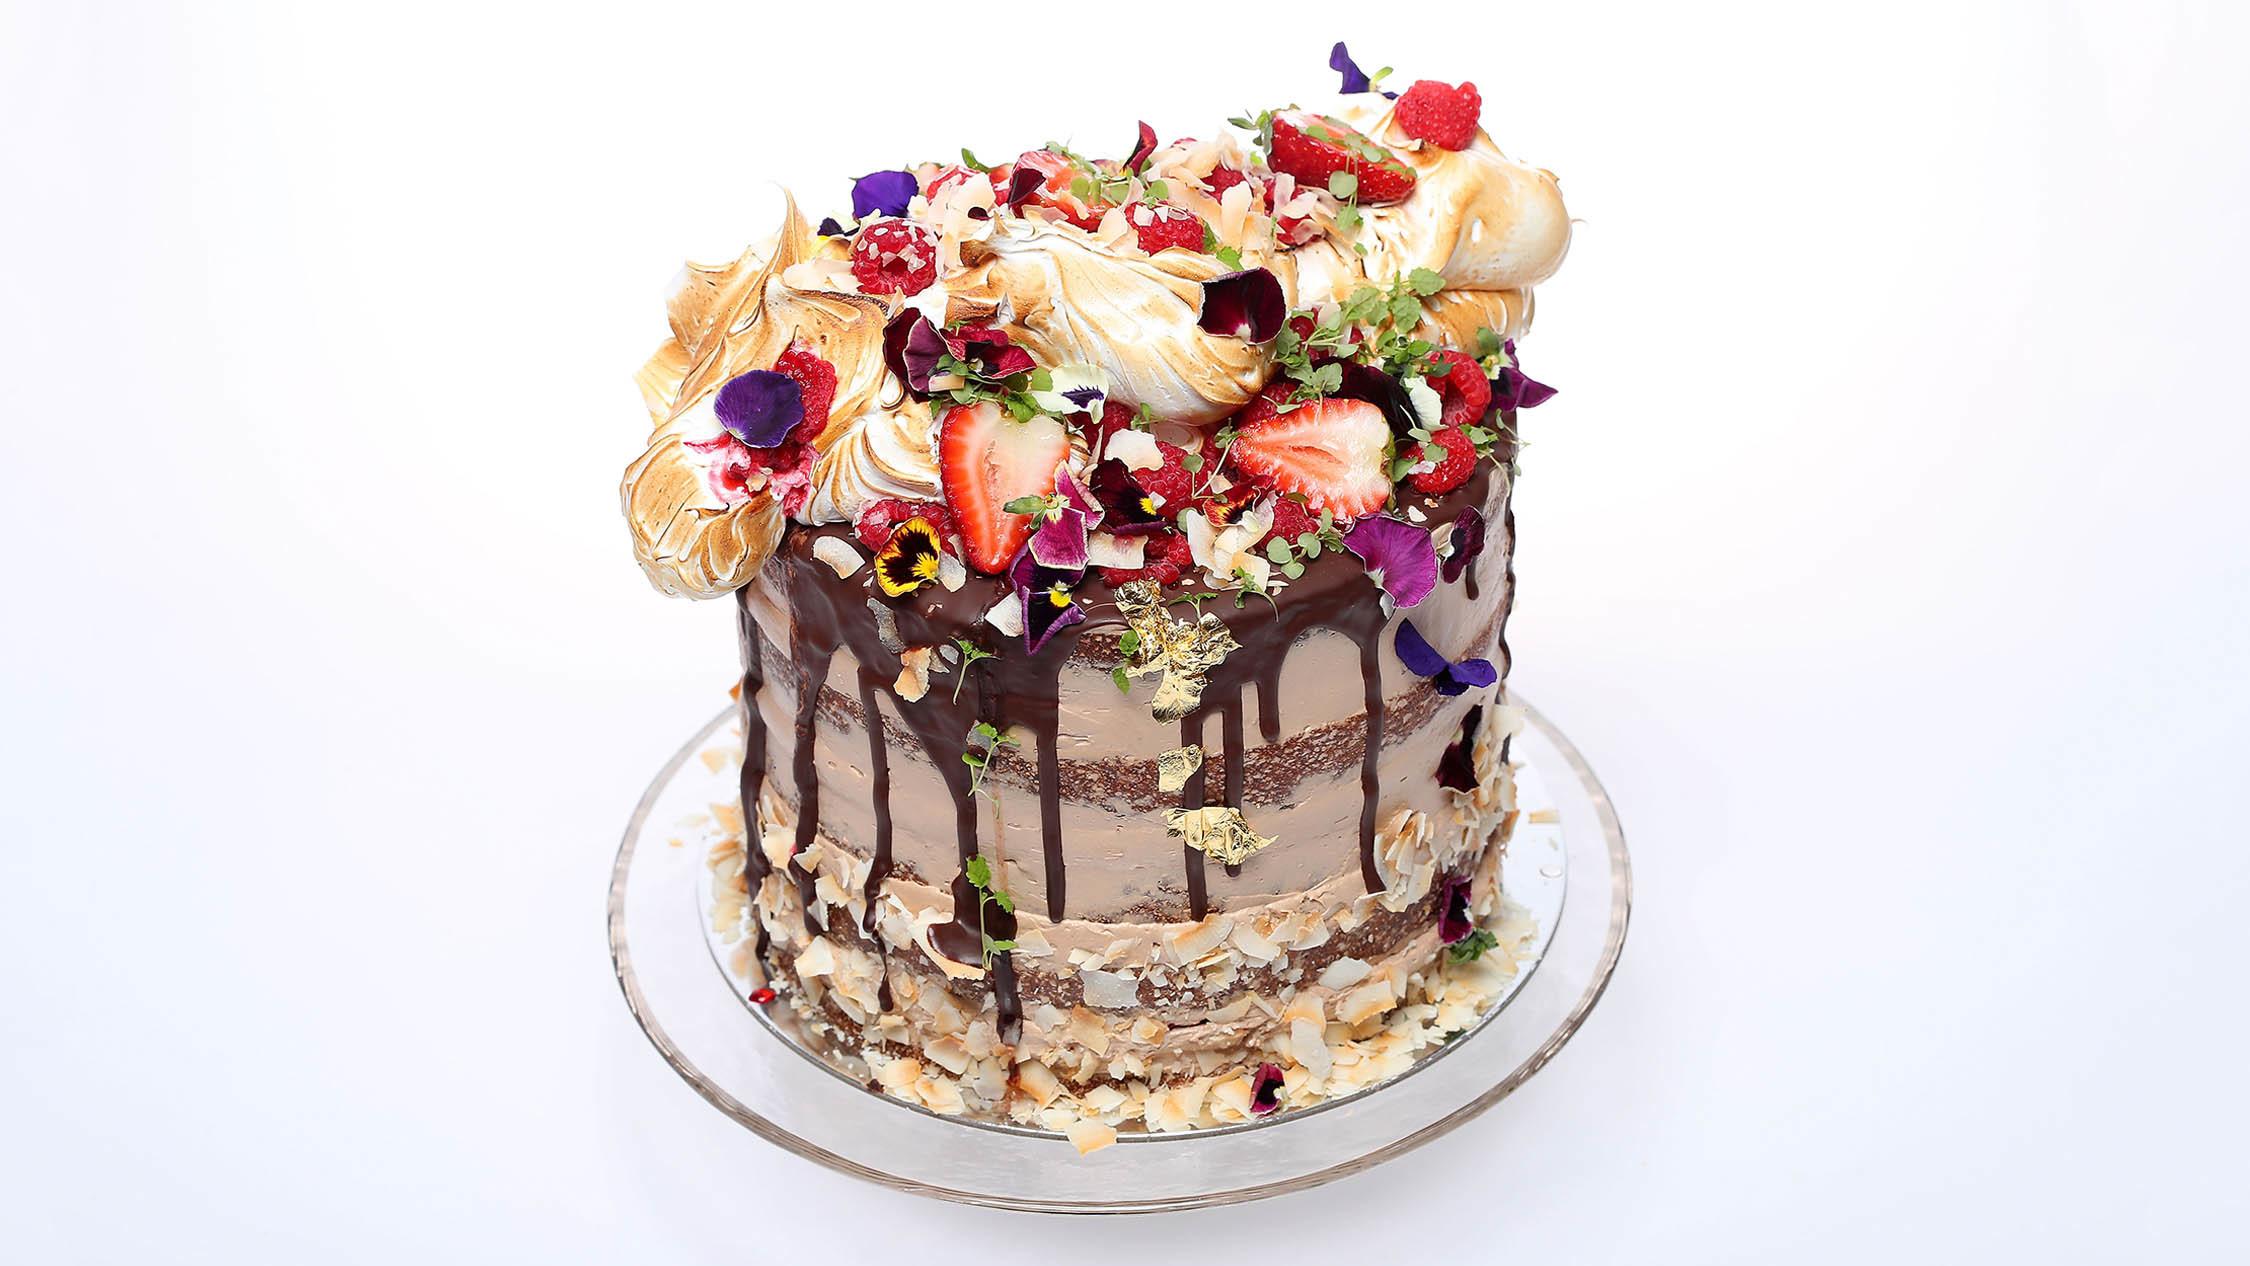 Millstone Lamington cake